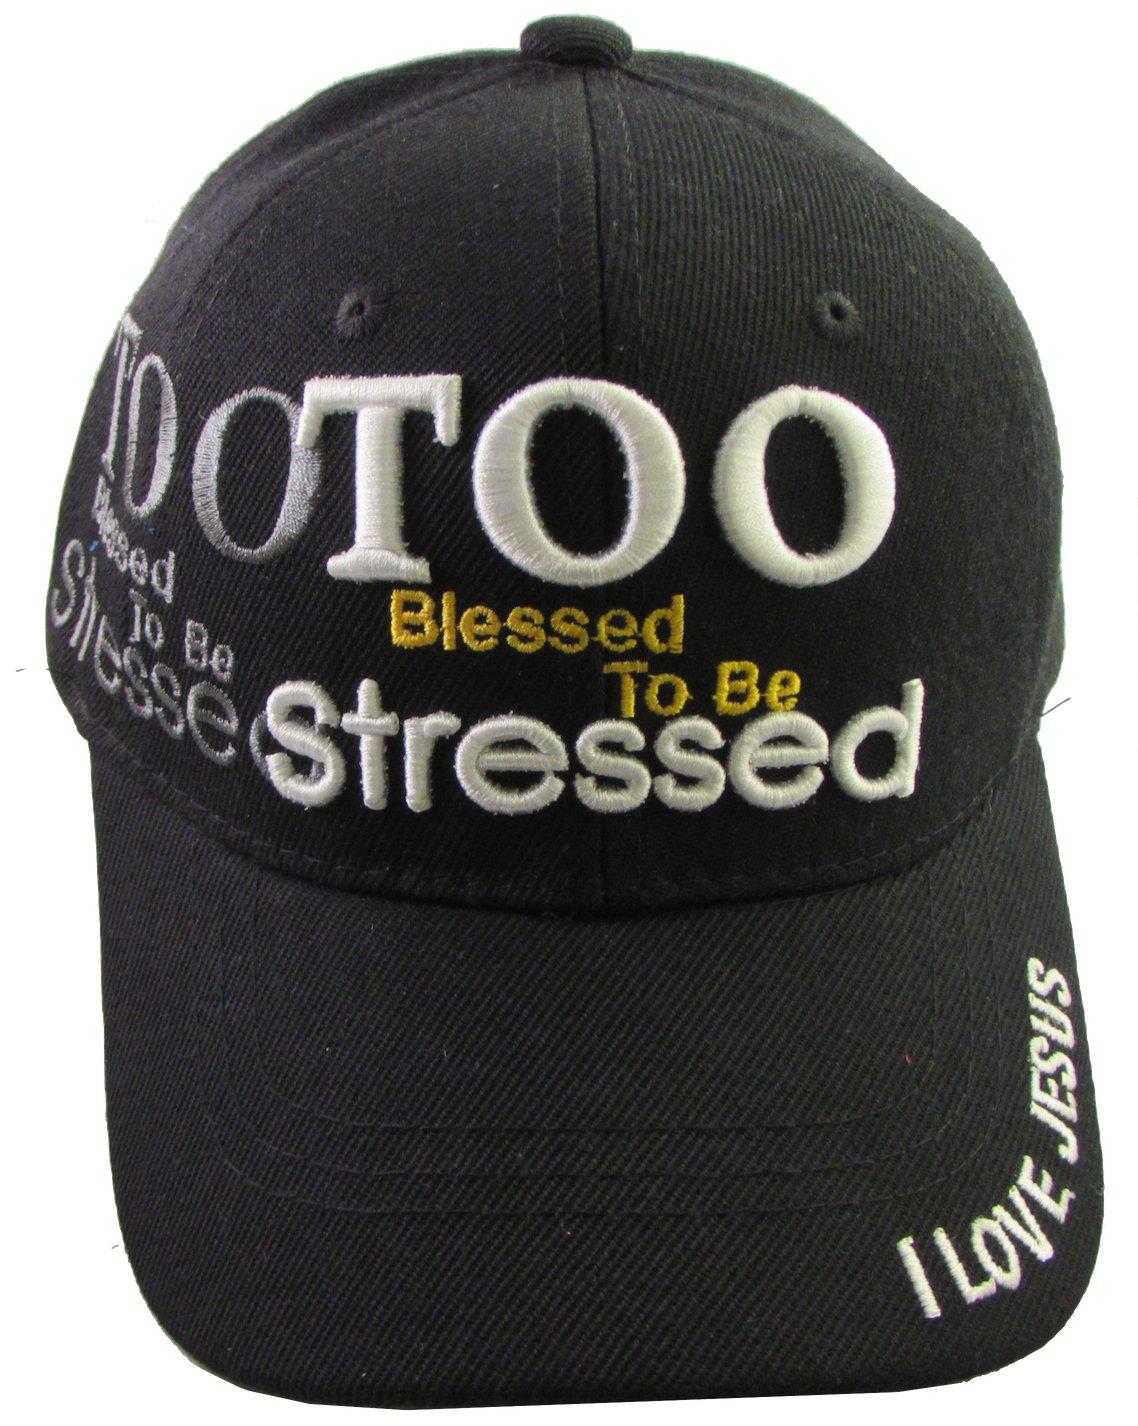 I LOVE JESUS - Christian Religious Baseball Style Cap - Adult Hat